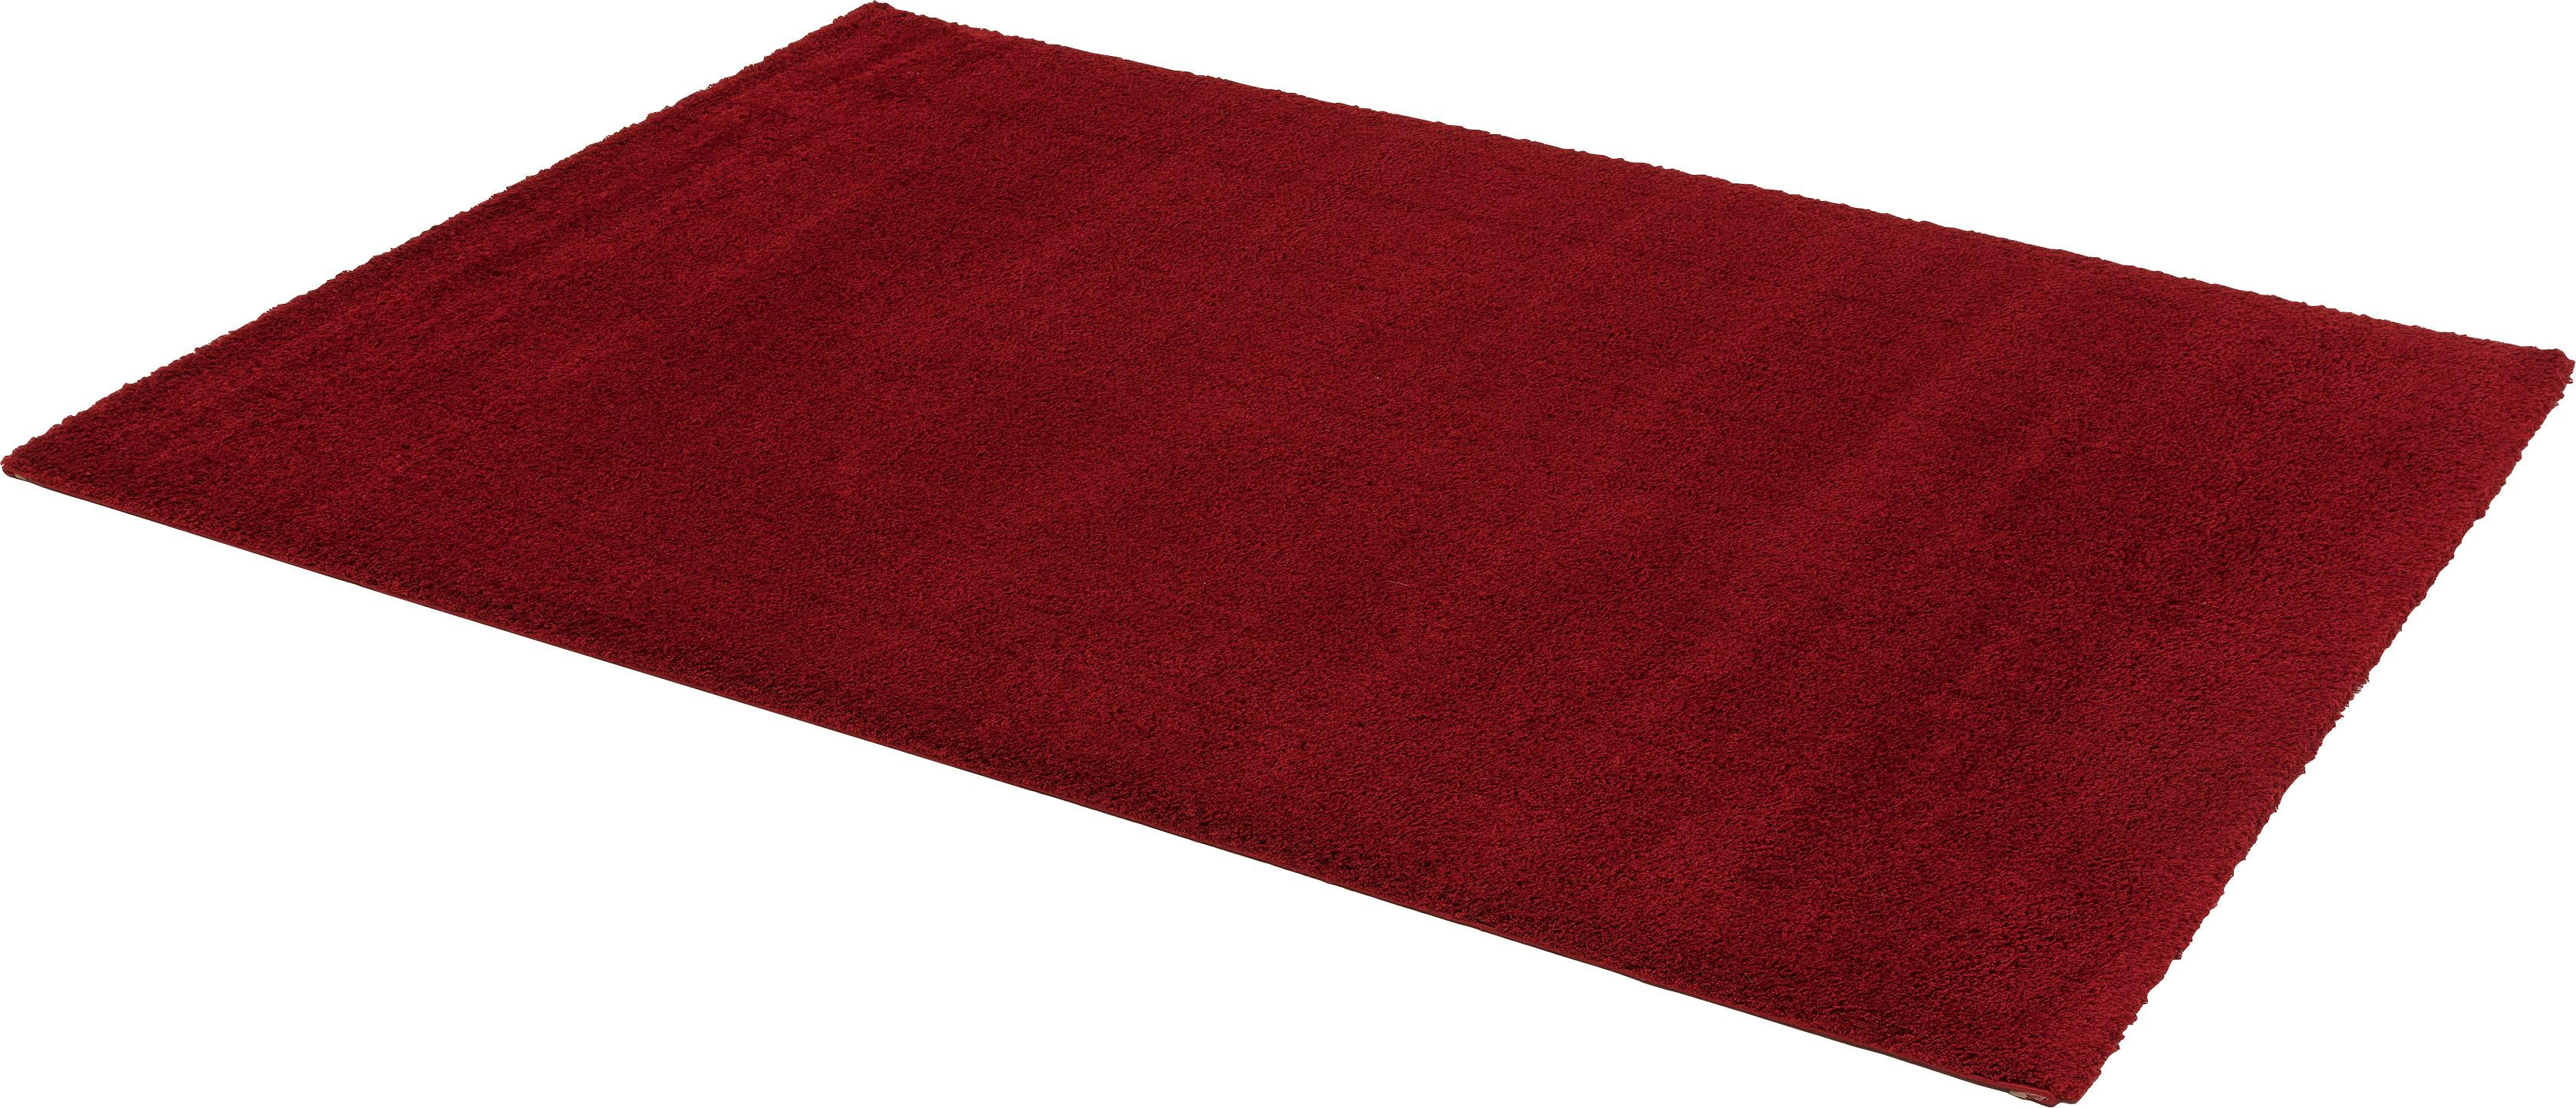 Hochflor-Teppich Rivoli ASTRA rechteckig Höhe 30 mm